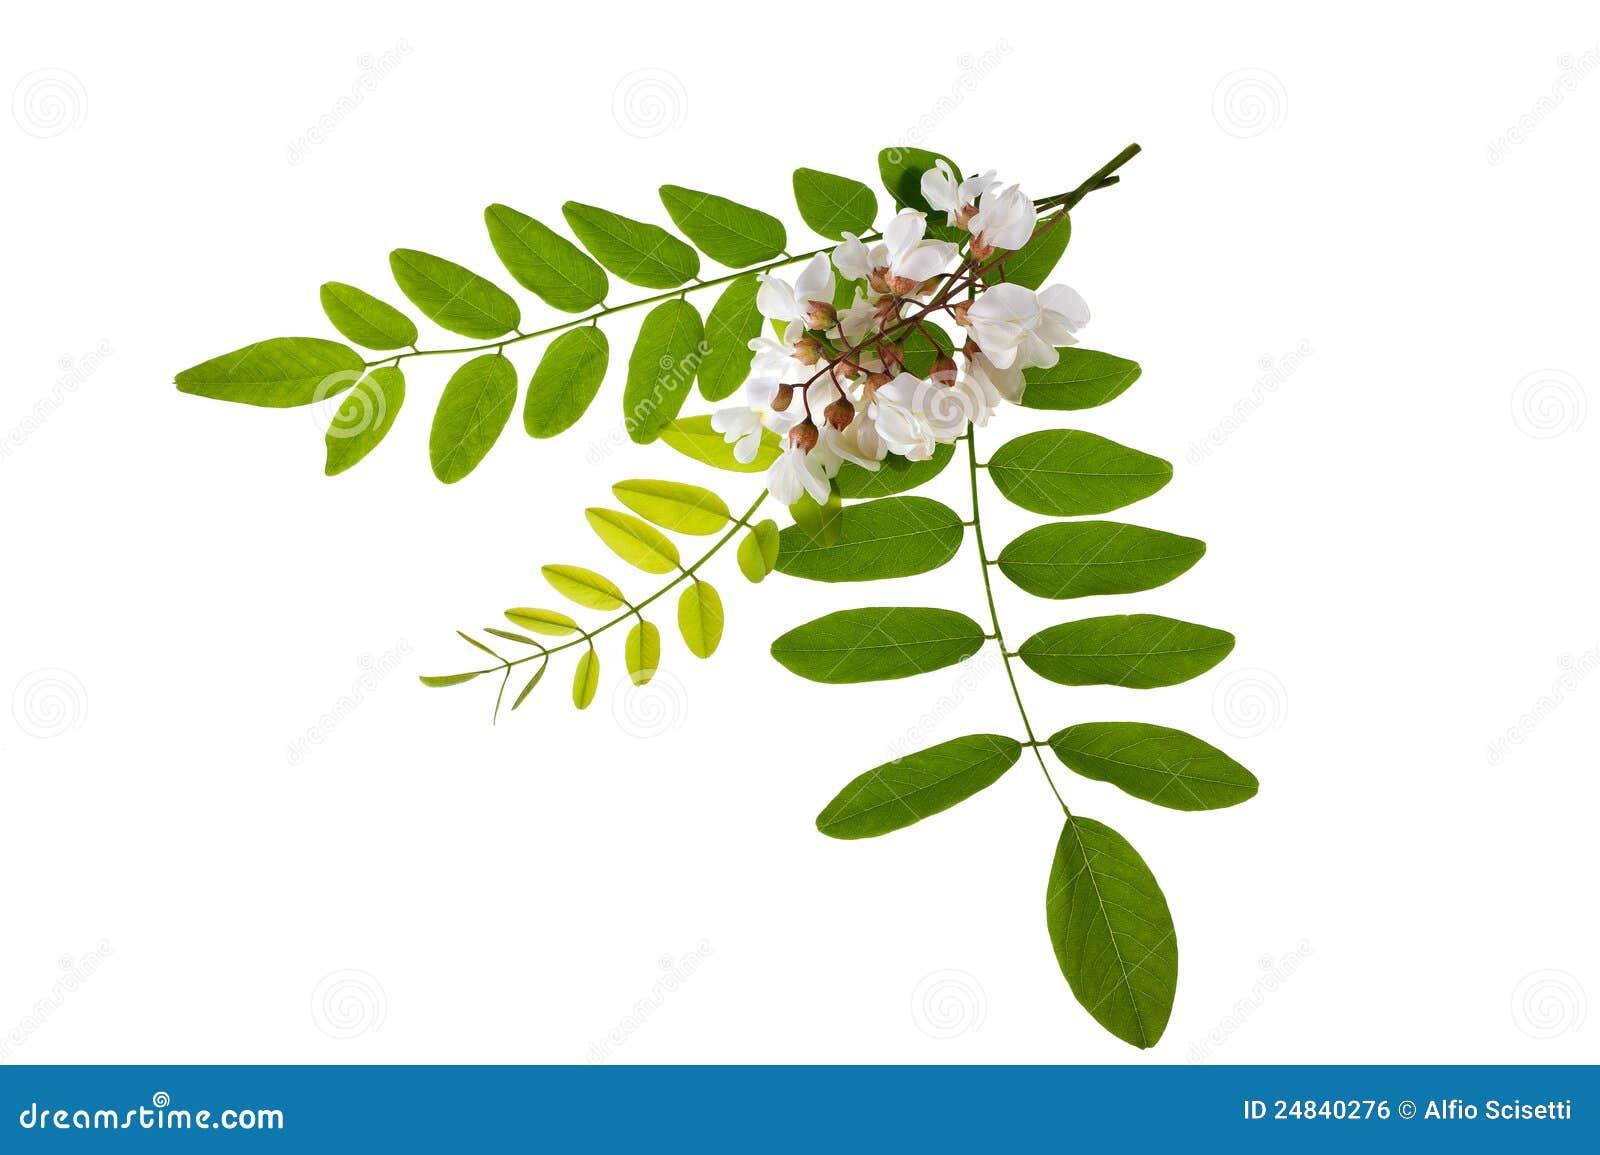 Acacia Royalty Free Stock Image - Image: 24840276 Oak Tree Clip Art